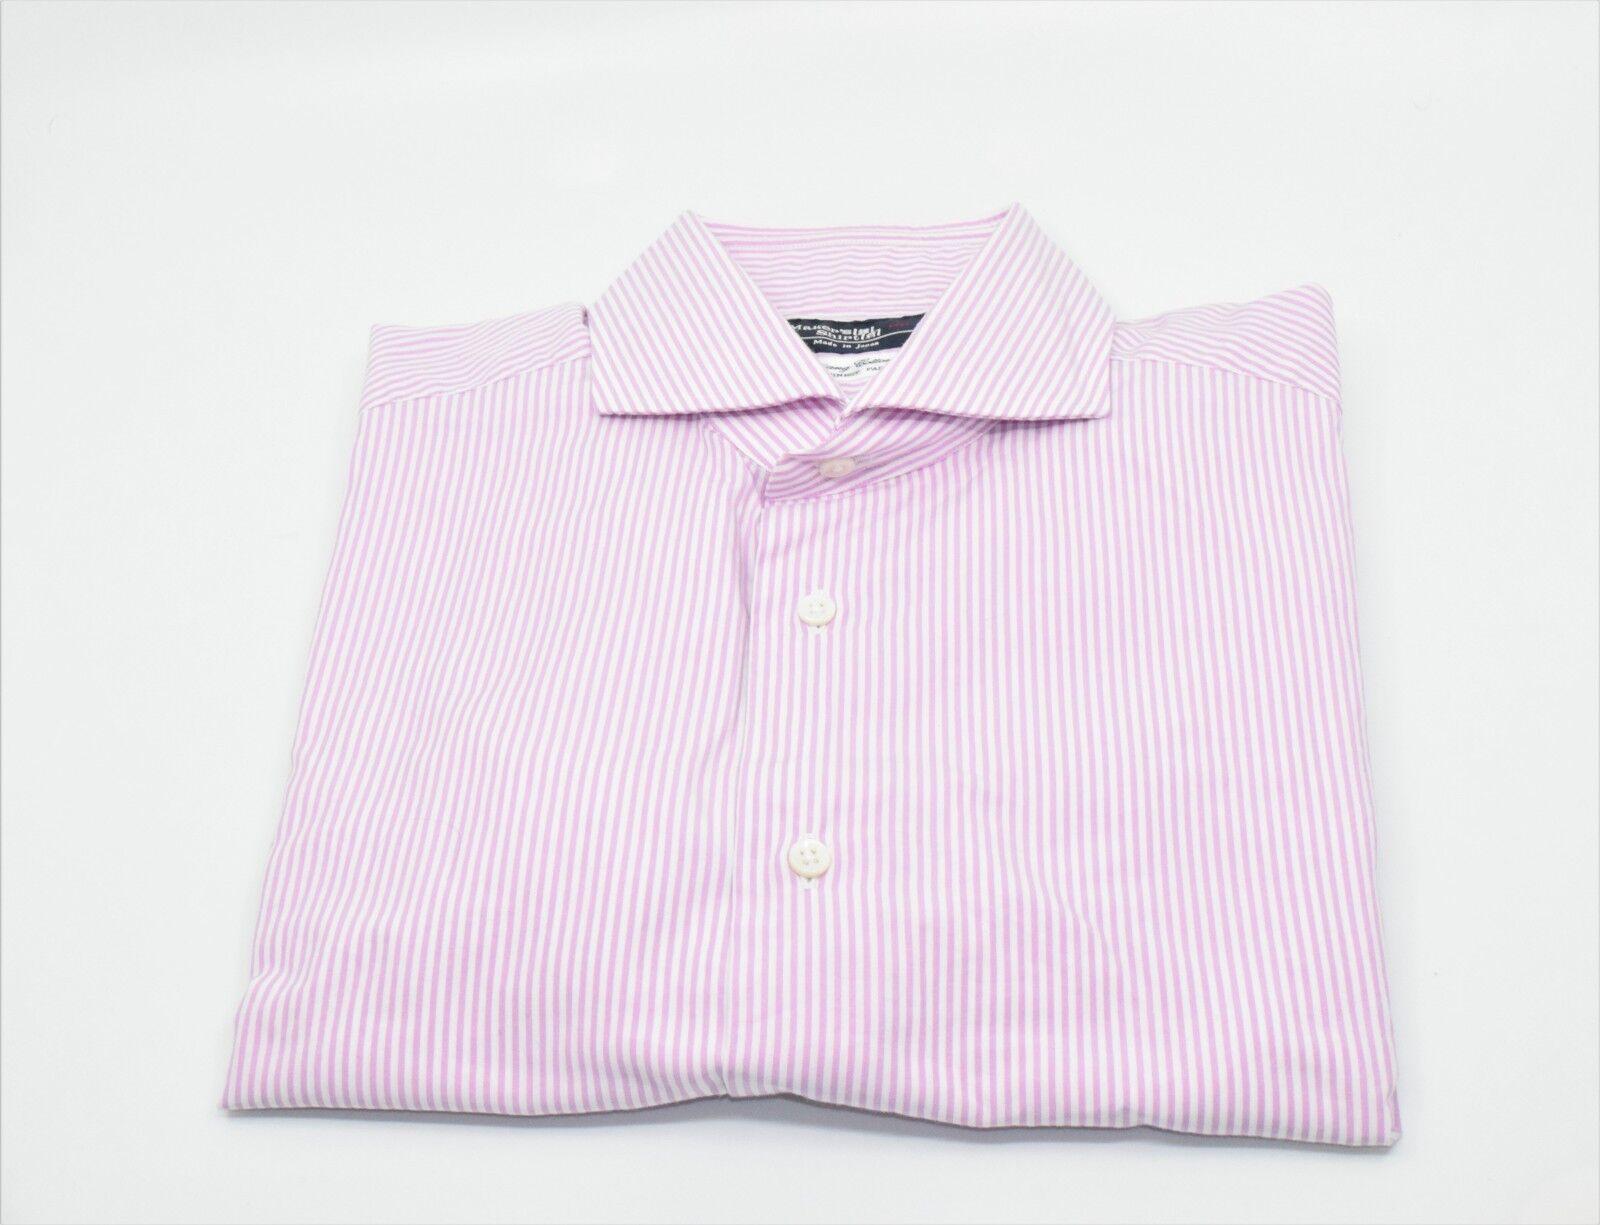 Kamakura Shirt Makers Men White purplec Striped Dress Shirt Size 16 100% Cotton